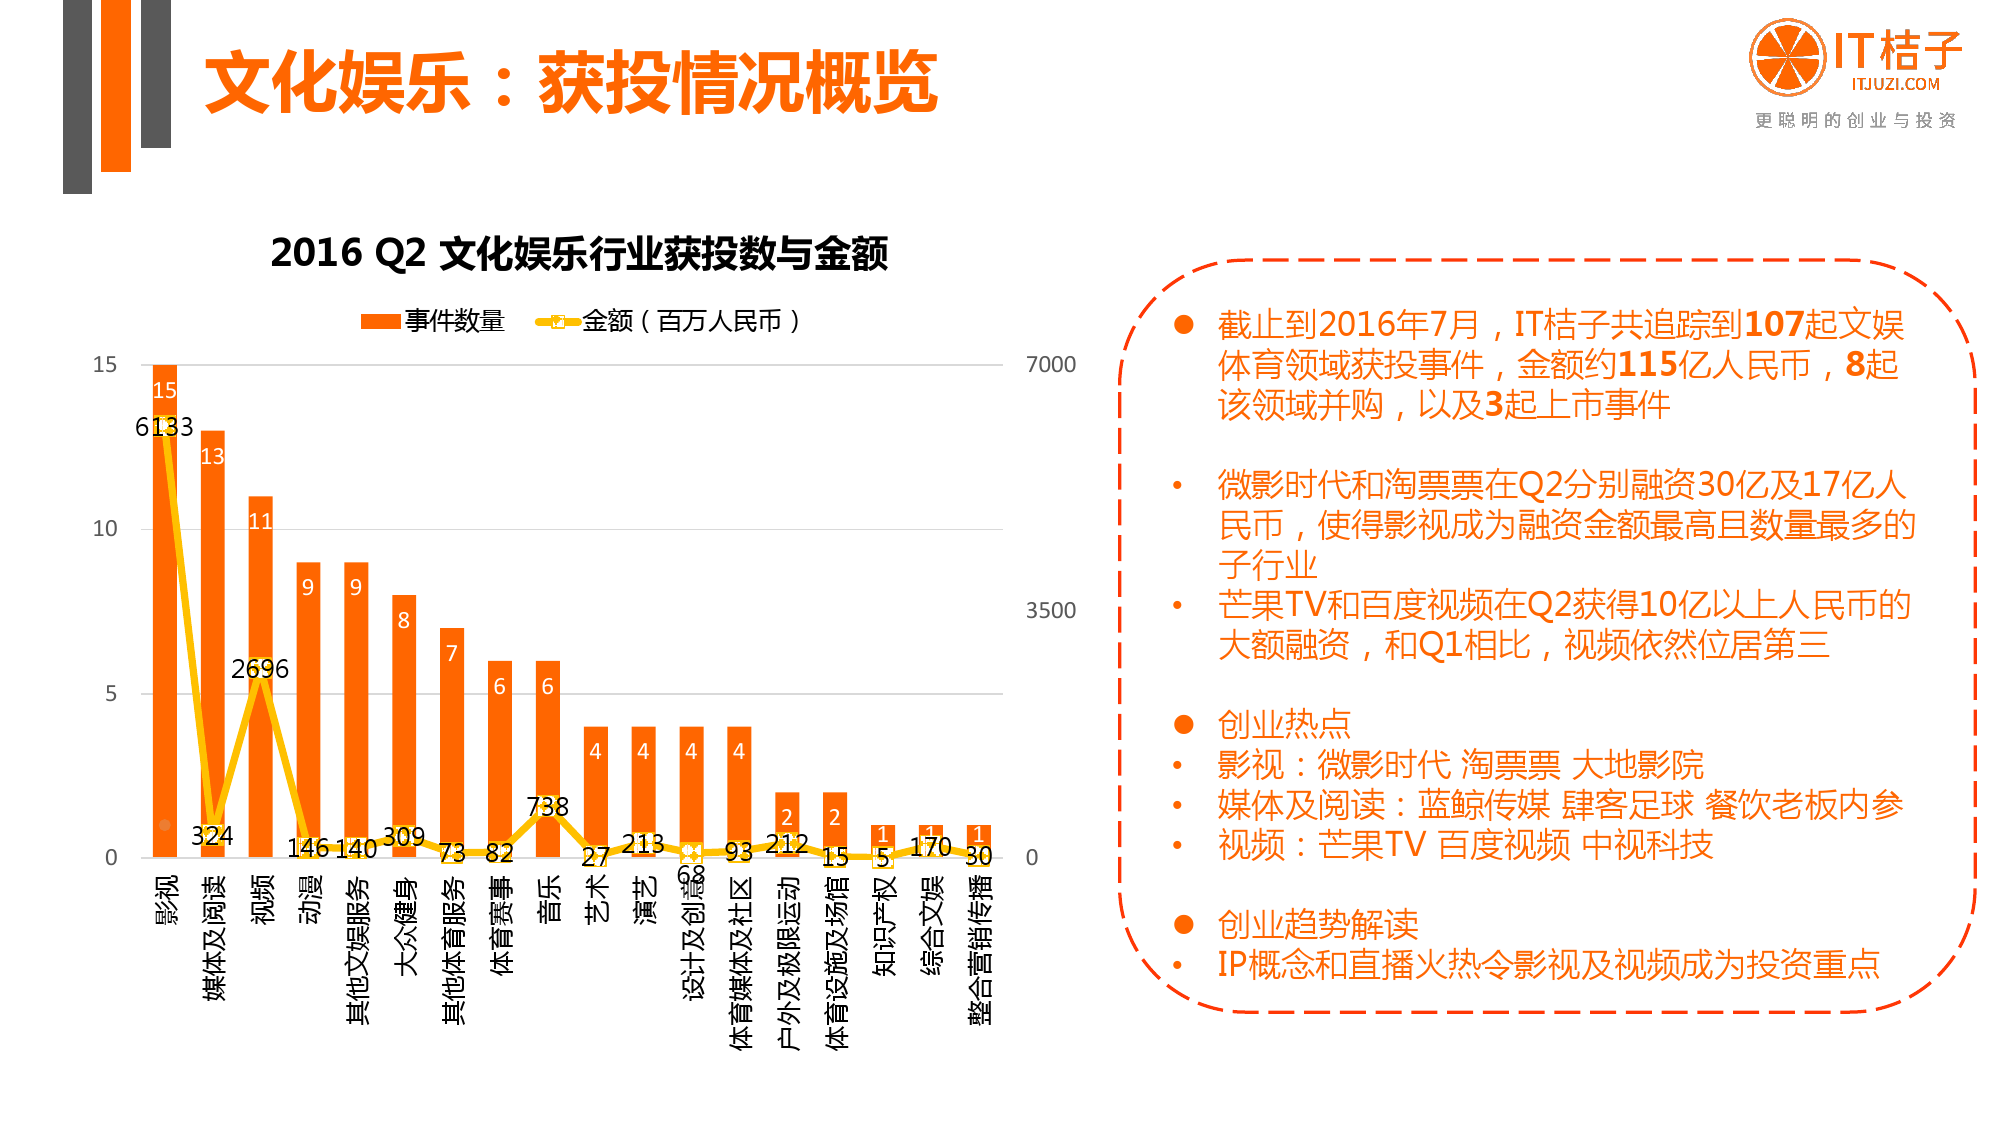 【IT桔子】2016年Q2中国互联网创业投资分析报告_000030